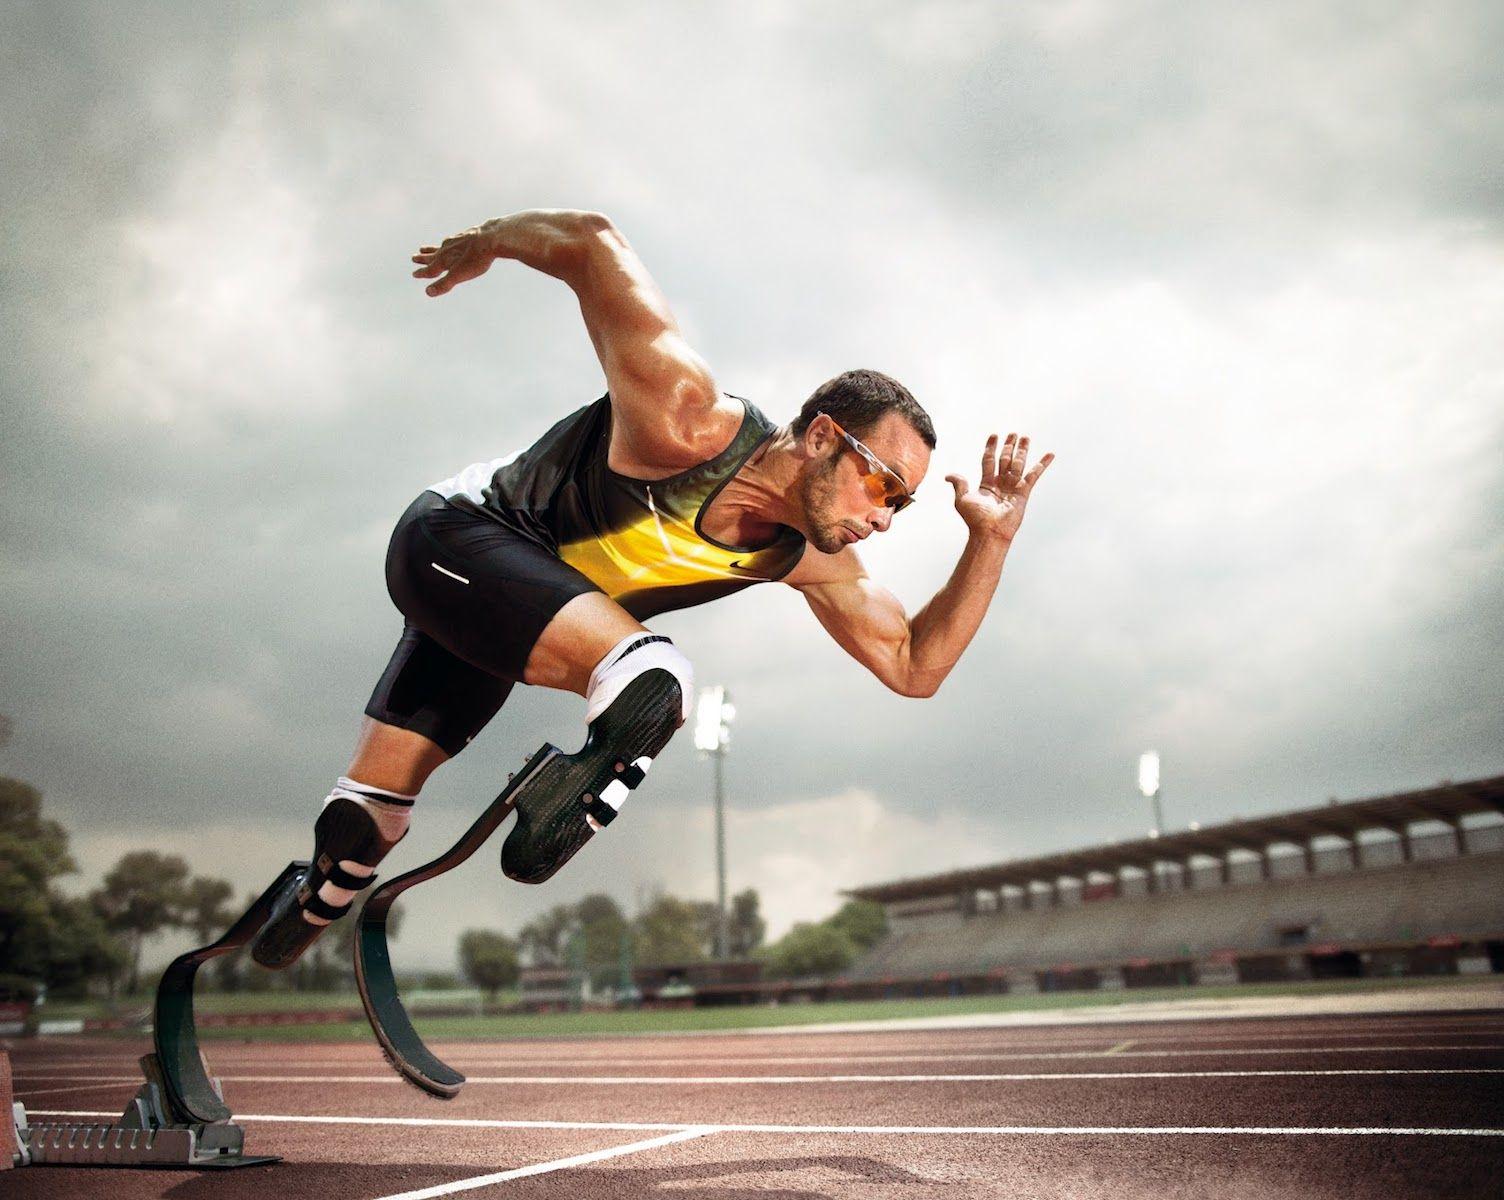 Oscar Pistorius Athlete Hd Wallpaper Wallpaper Details Oscar Pistorius Sports Photography Paralympics